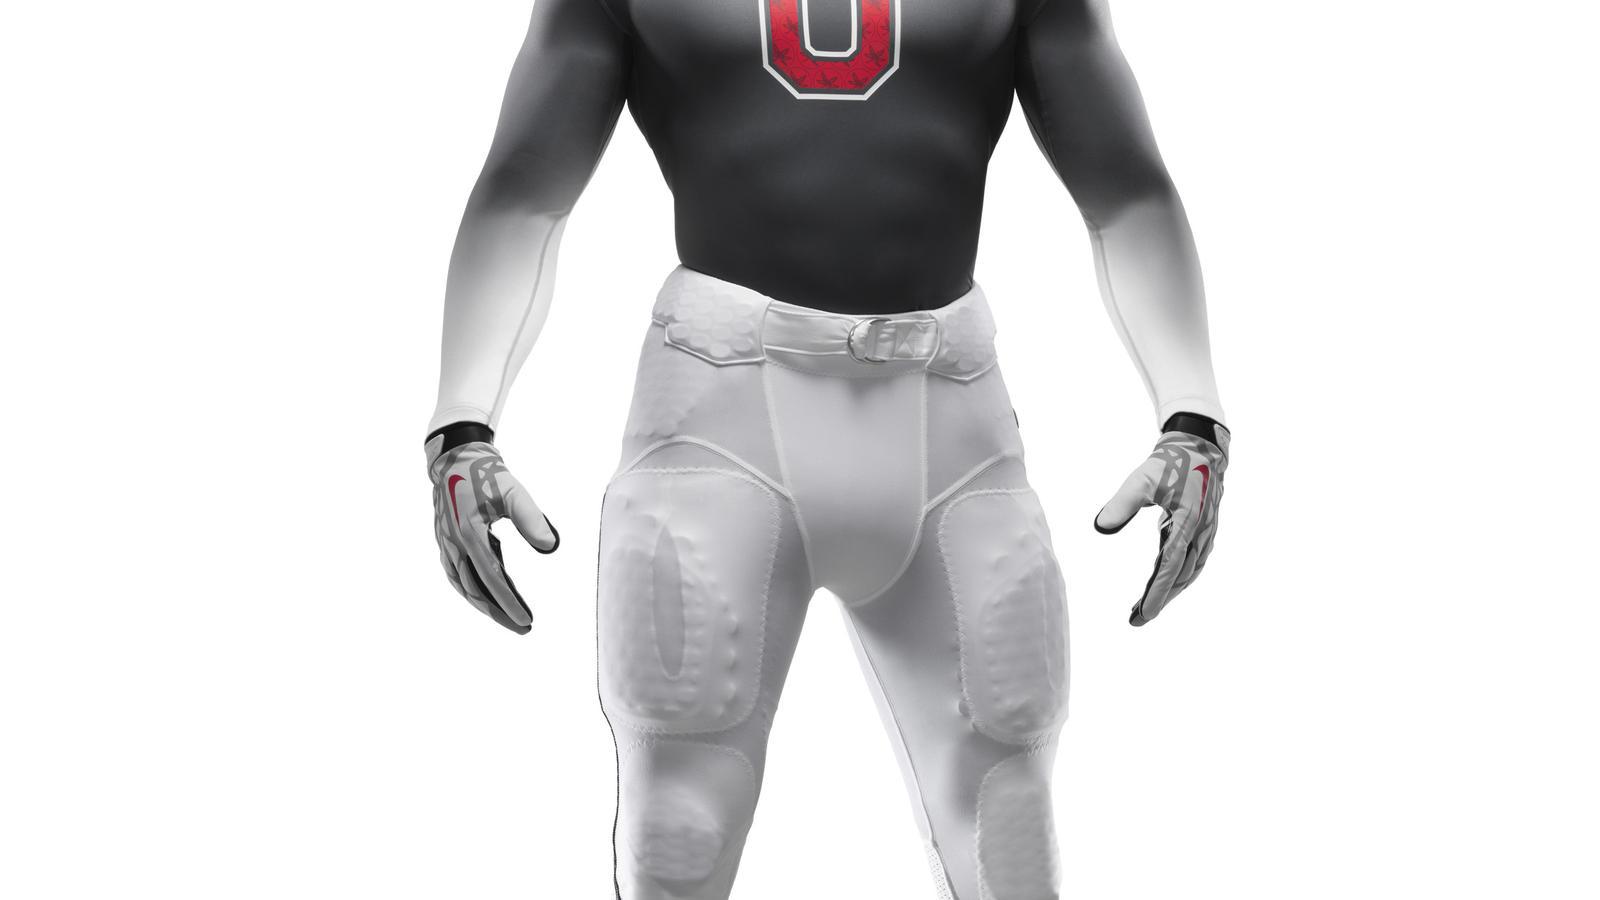 ncaa_fb13_uniforms_ohio_base_layer_0030